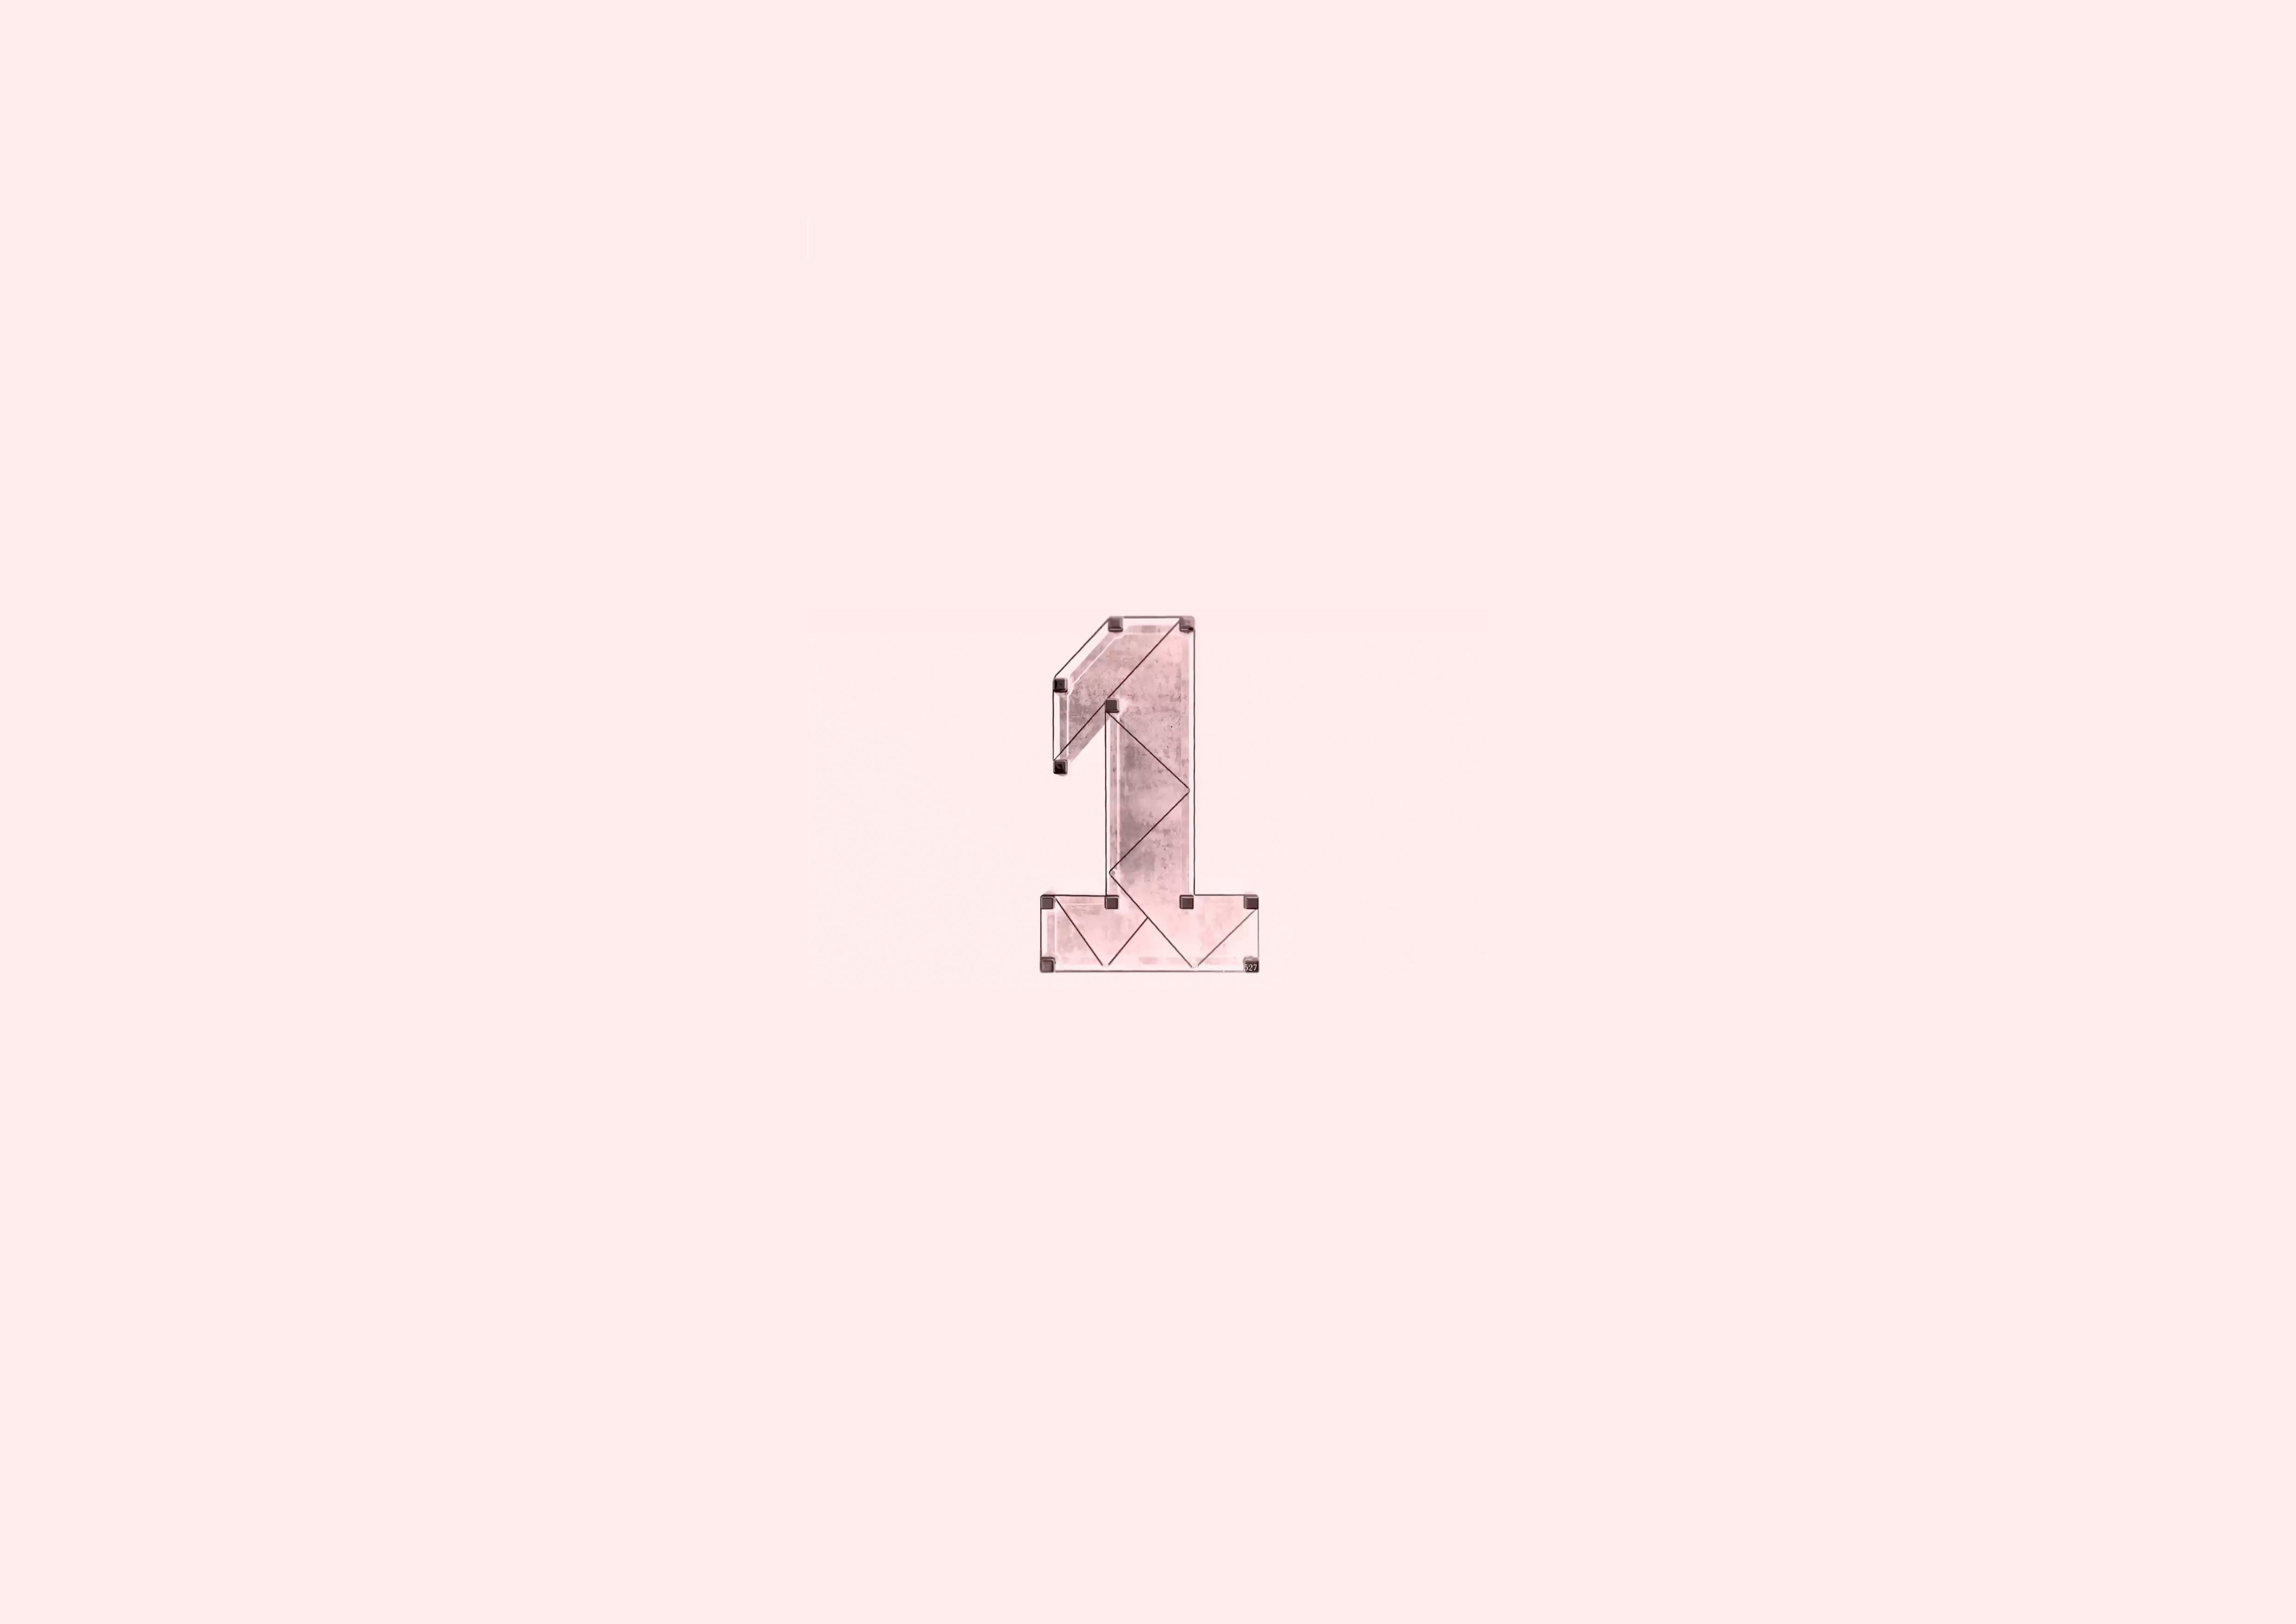 Wanna One 1 X 1 Undivided Desktop Wallpaper Wanna One In 2019